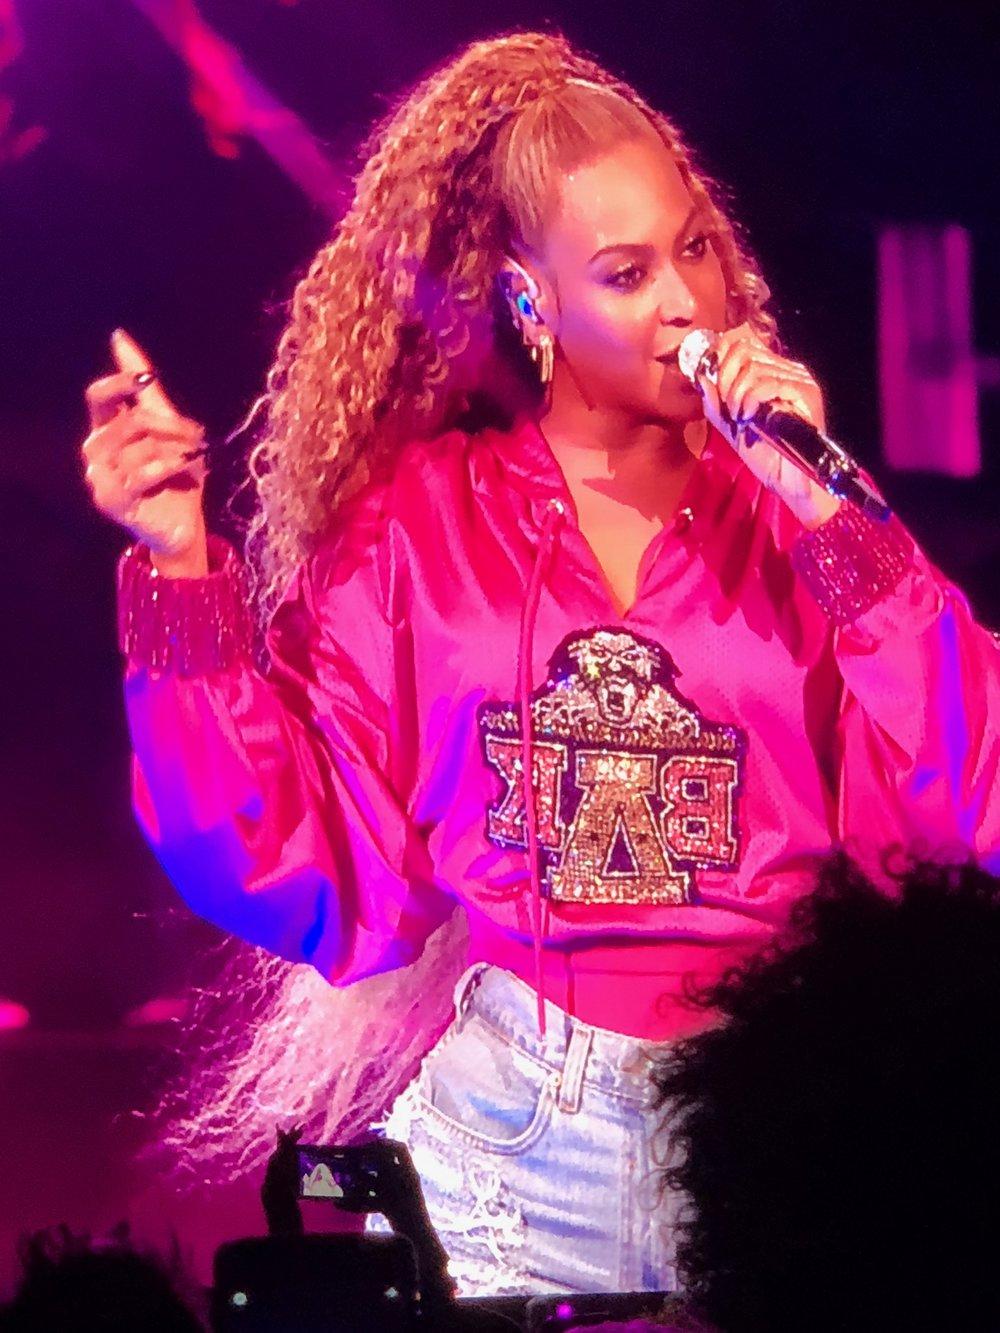 First Black Woman to Headline Coachella -